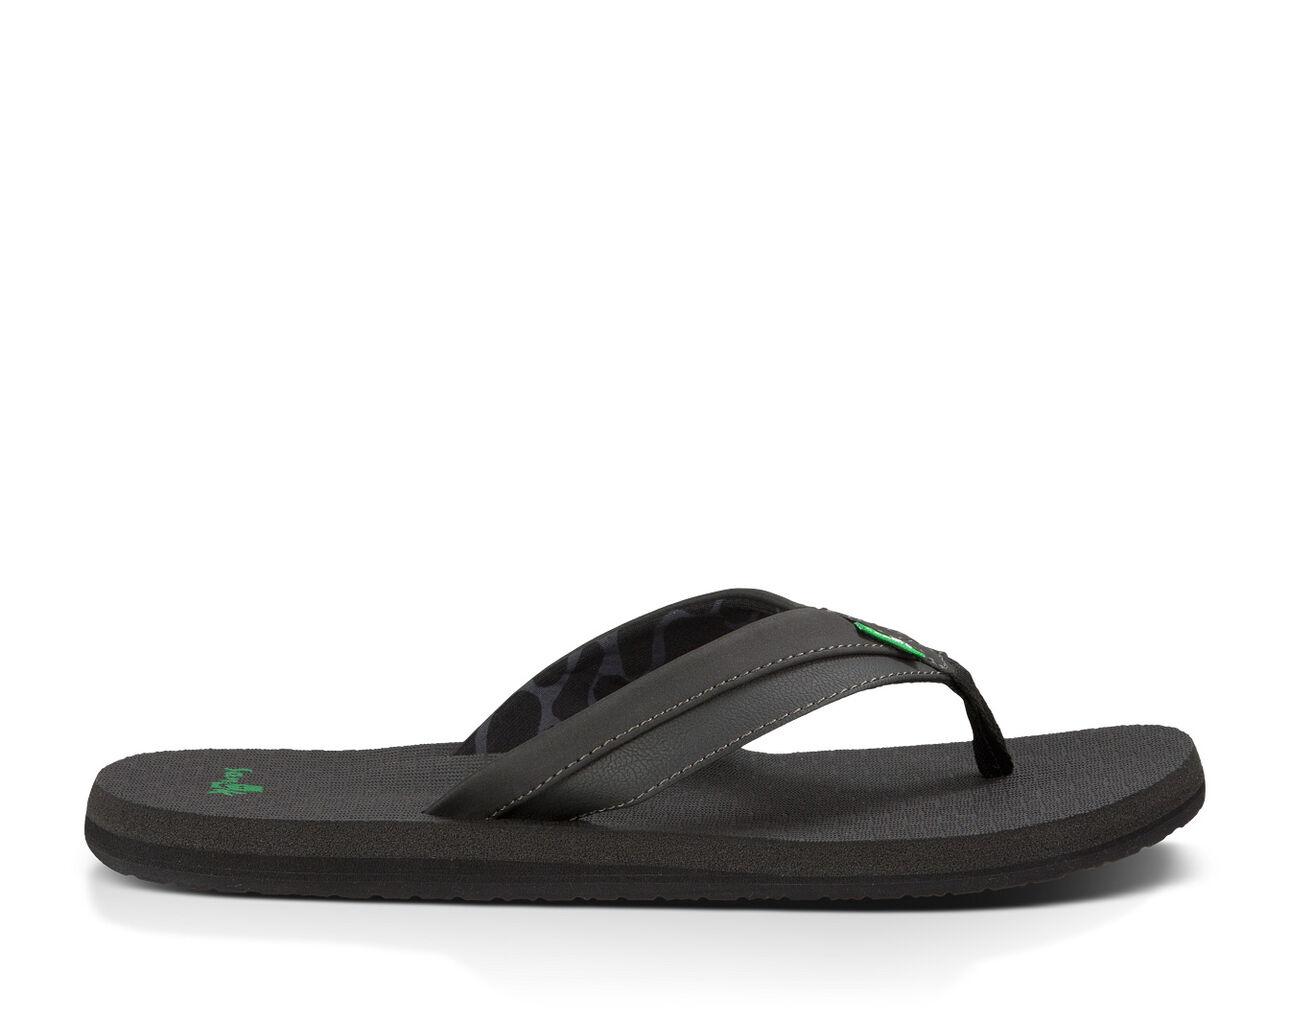 e94292af5c5 Men s Sanuk Shoes